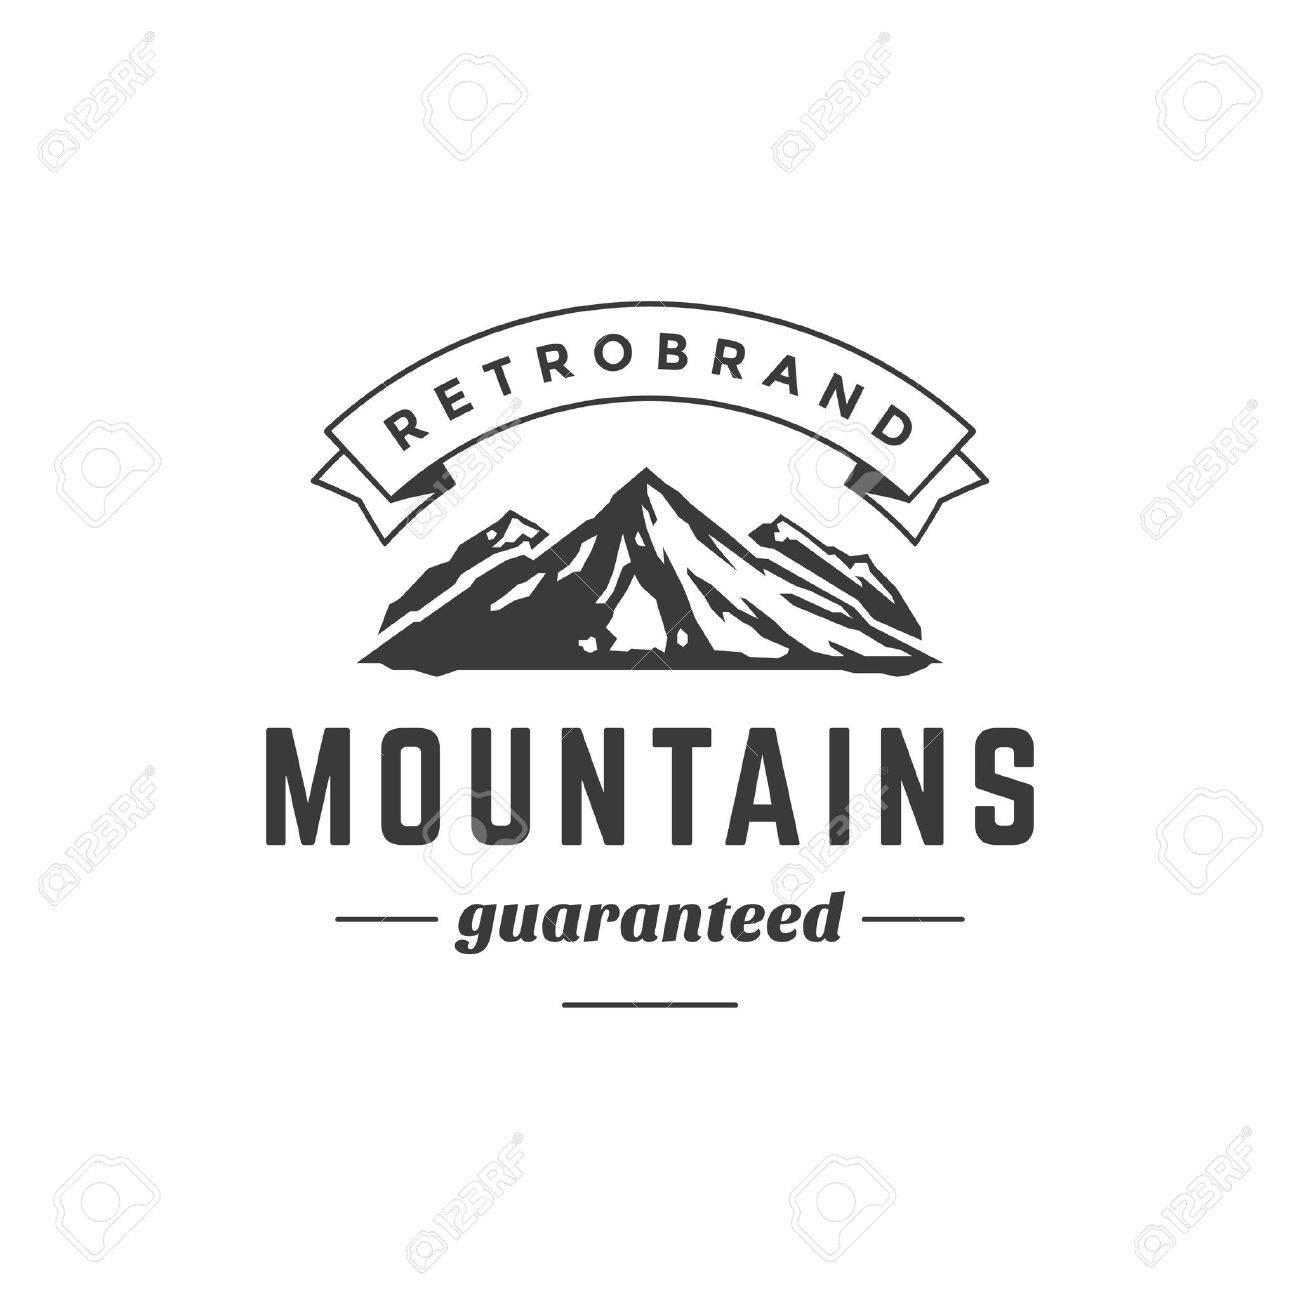 Insignia De La Montaña De La Vendimia Plantilla Del Emblema. Silueta ...